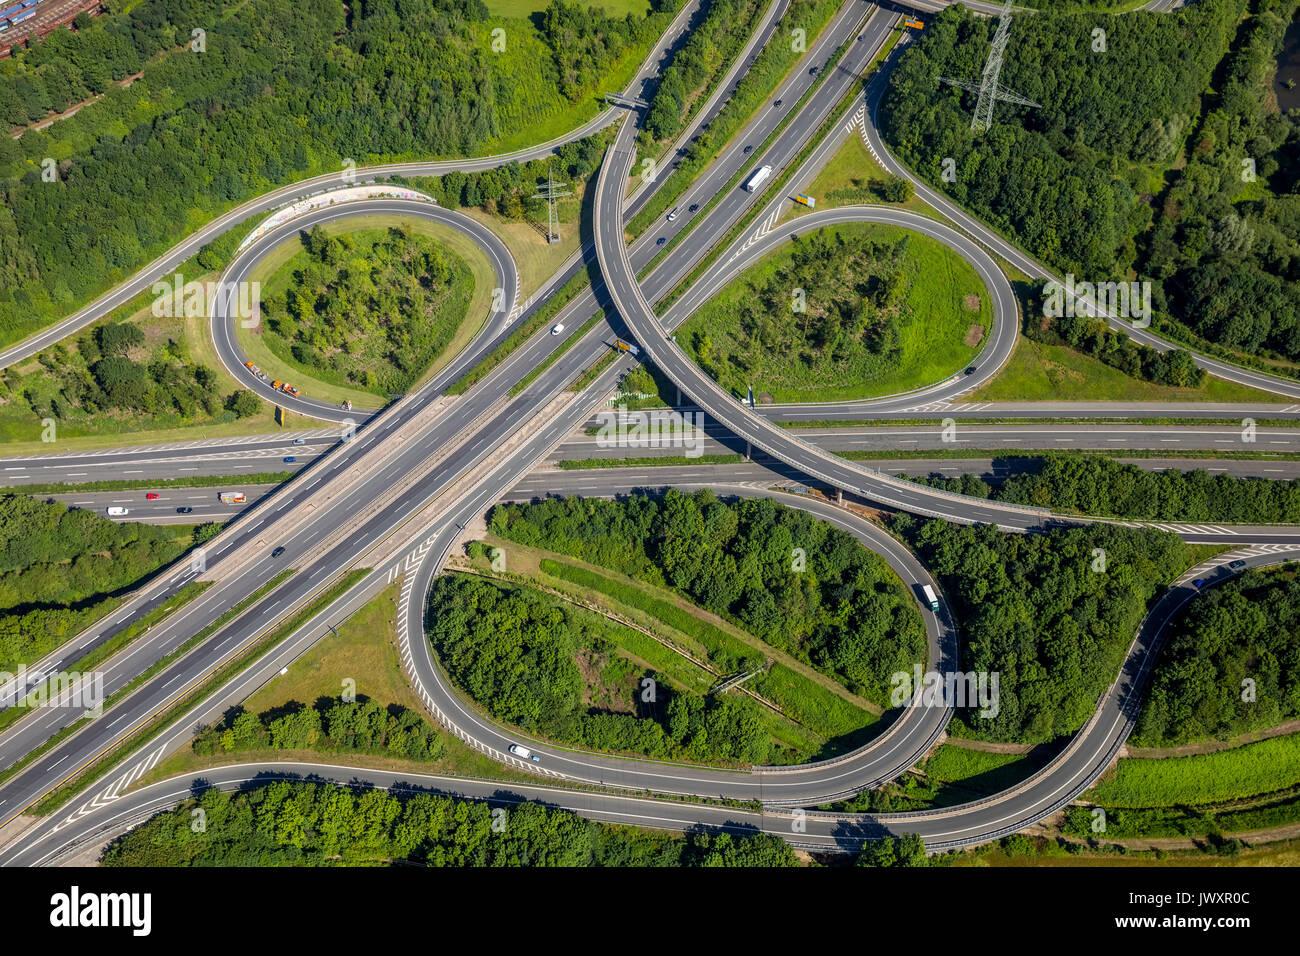 Springorumknoten, interchange Springorum, spaghetti nodi, autostrada, autostrade, B236, Brackeler Hellweg, Dortmund, la zona della Ruhr, Renania settentrionale-Vestfalia, Ge Immagini Stock